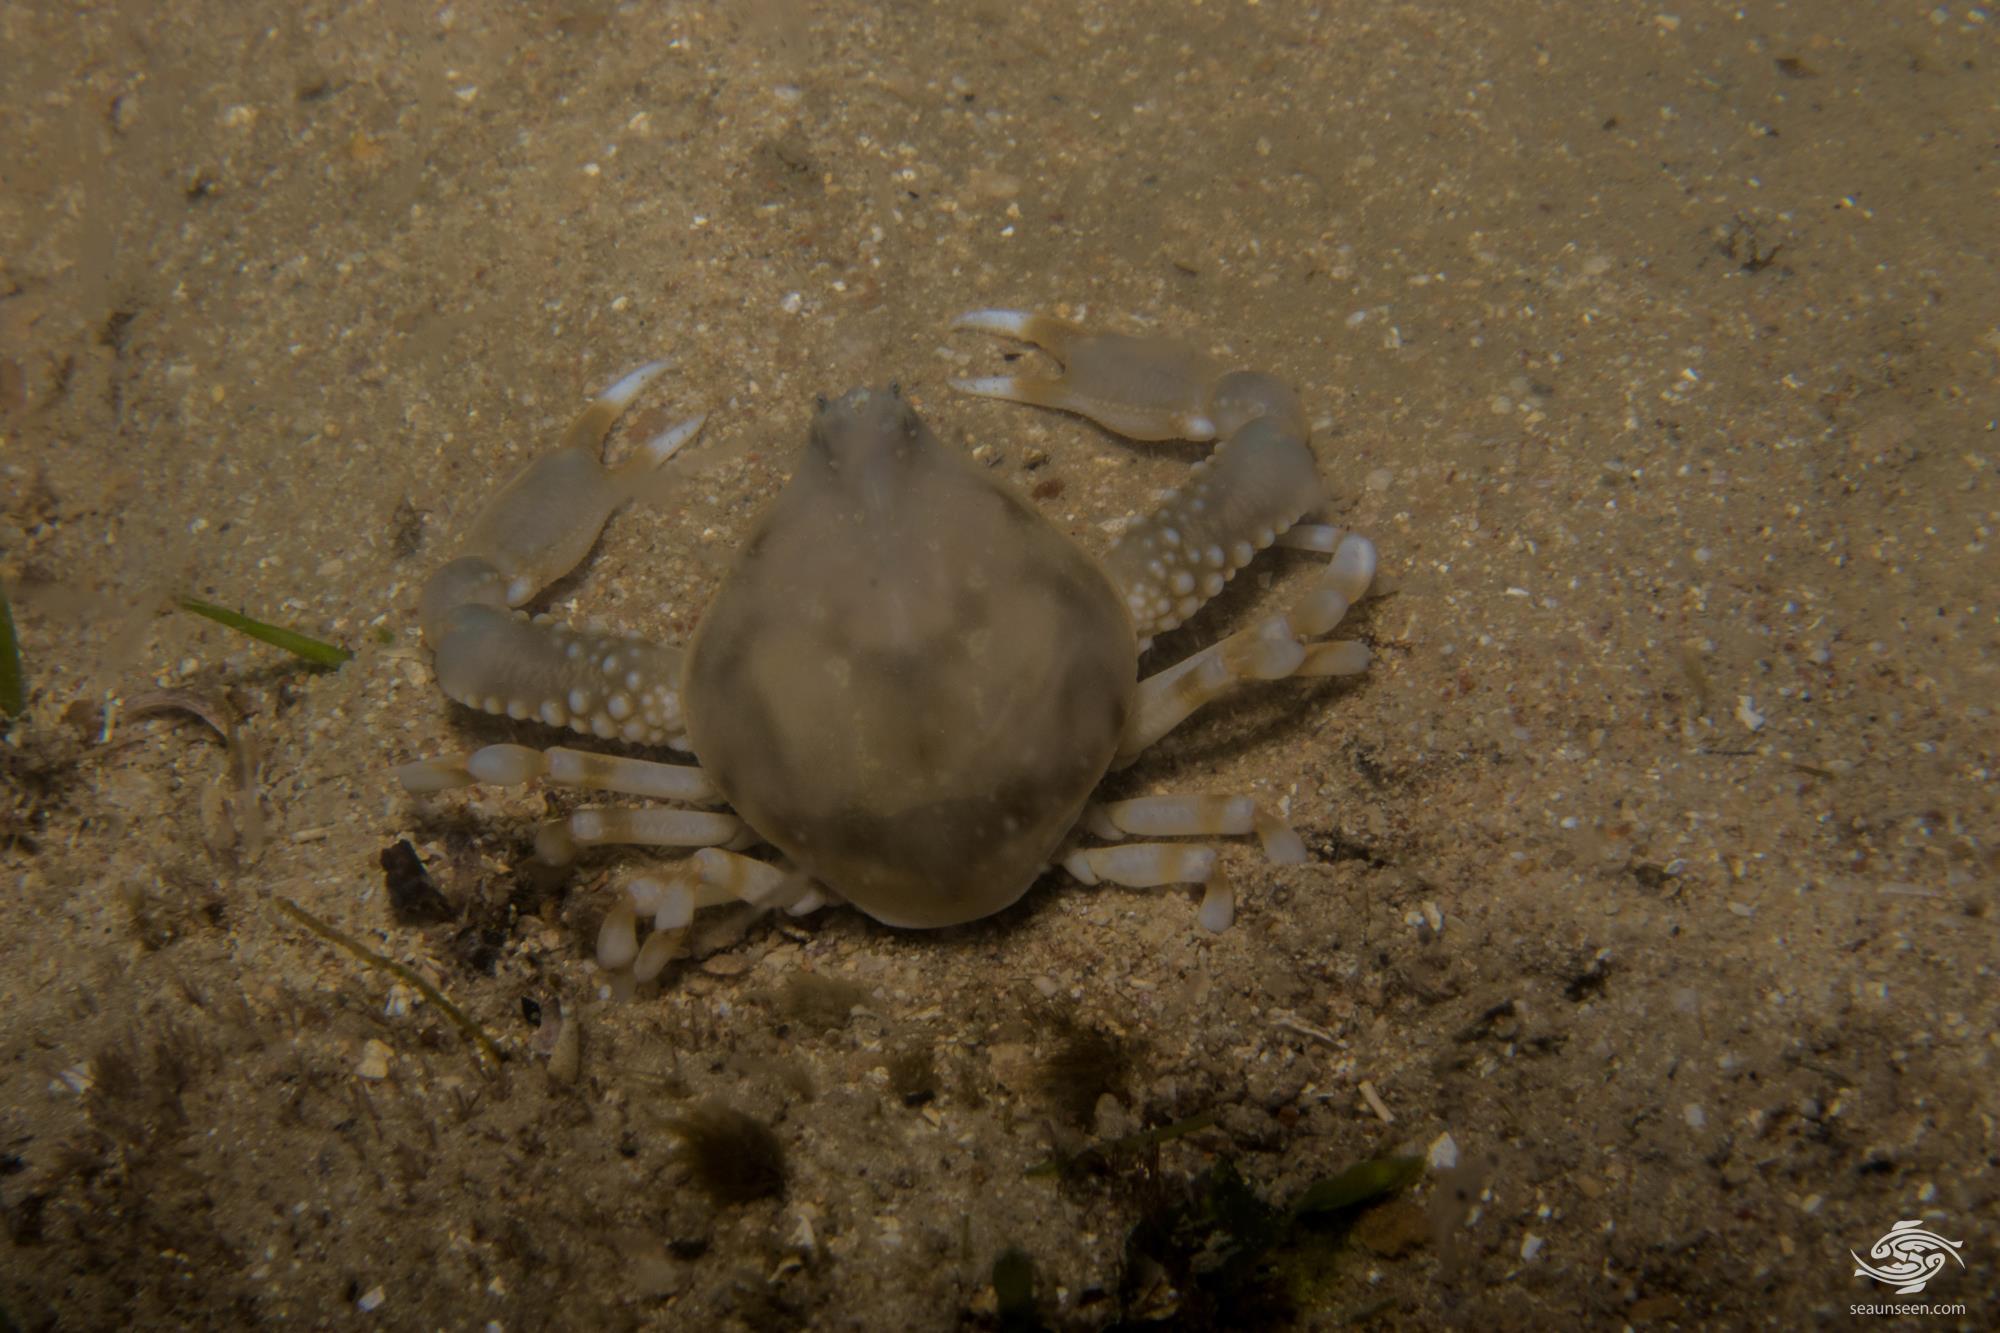 Olive Purse Crab, Leucosia pubescens